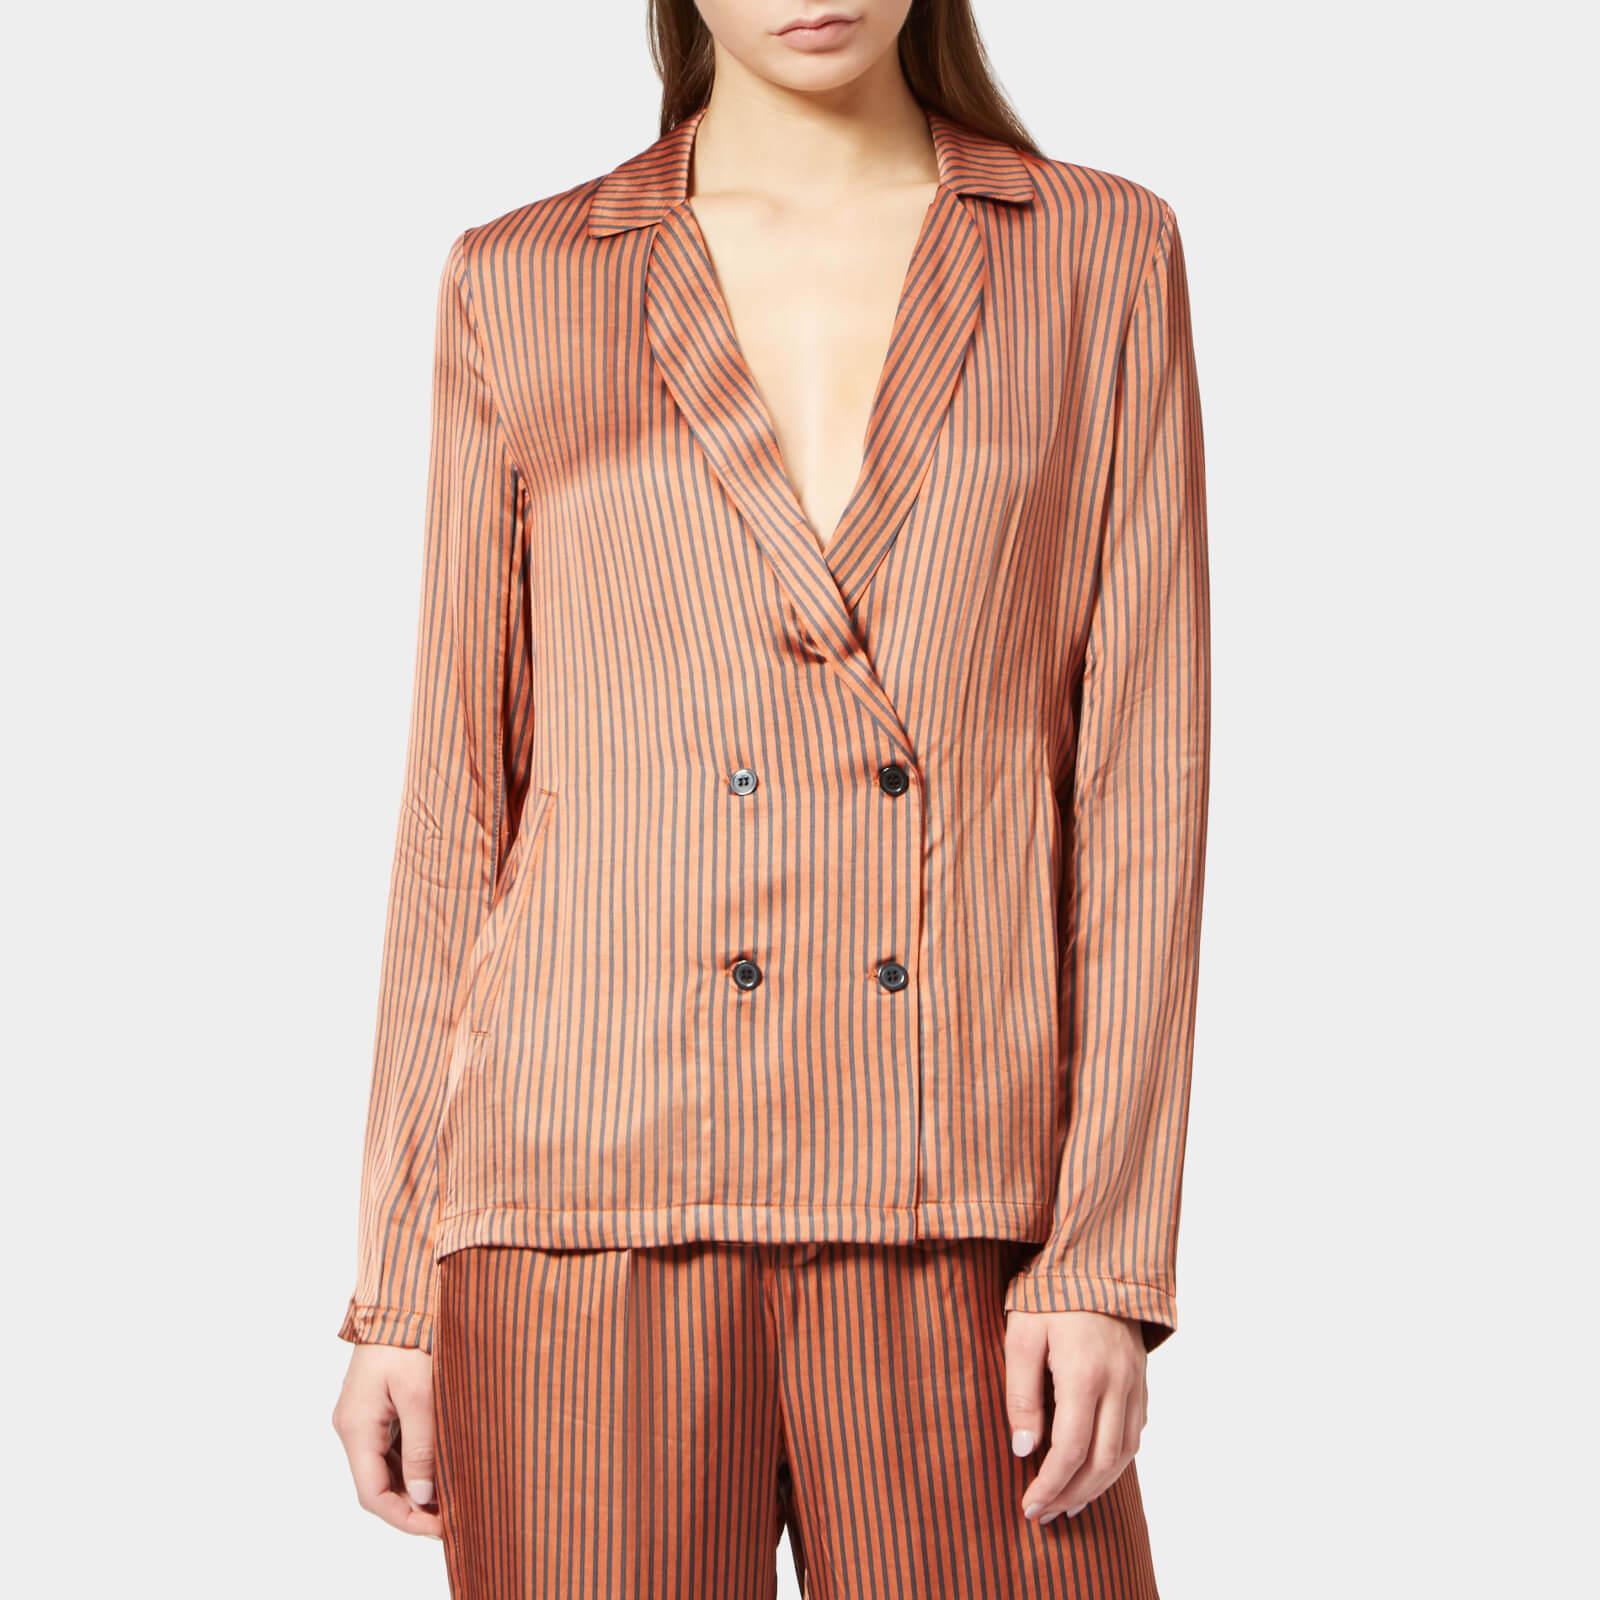 Gestuz Women's Veronica Shirt - Ginger Stripe - EU 40/UK 12 - Beige